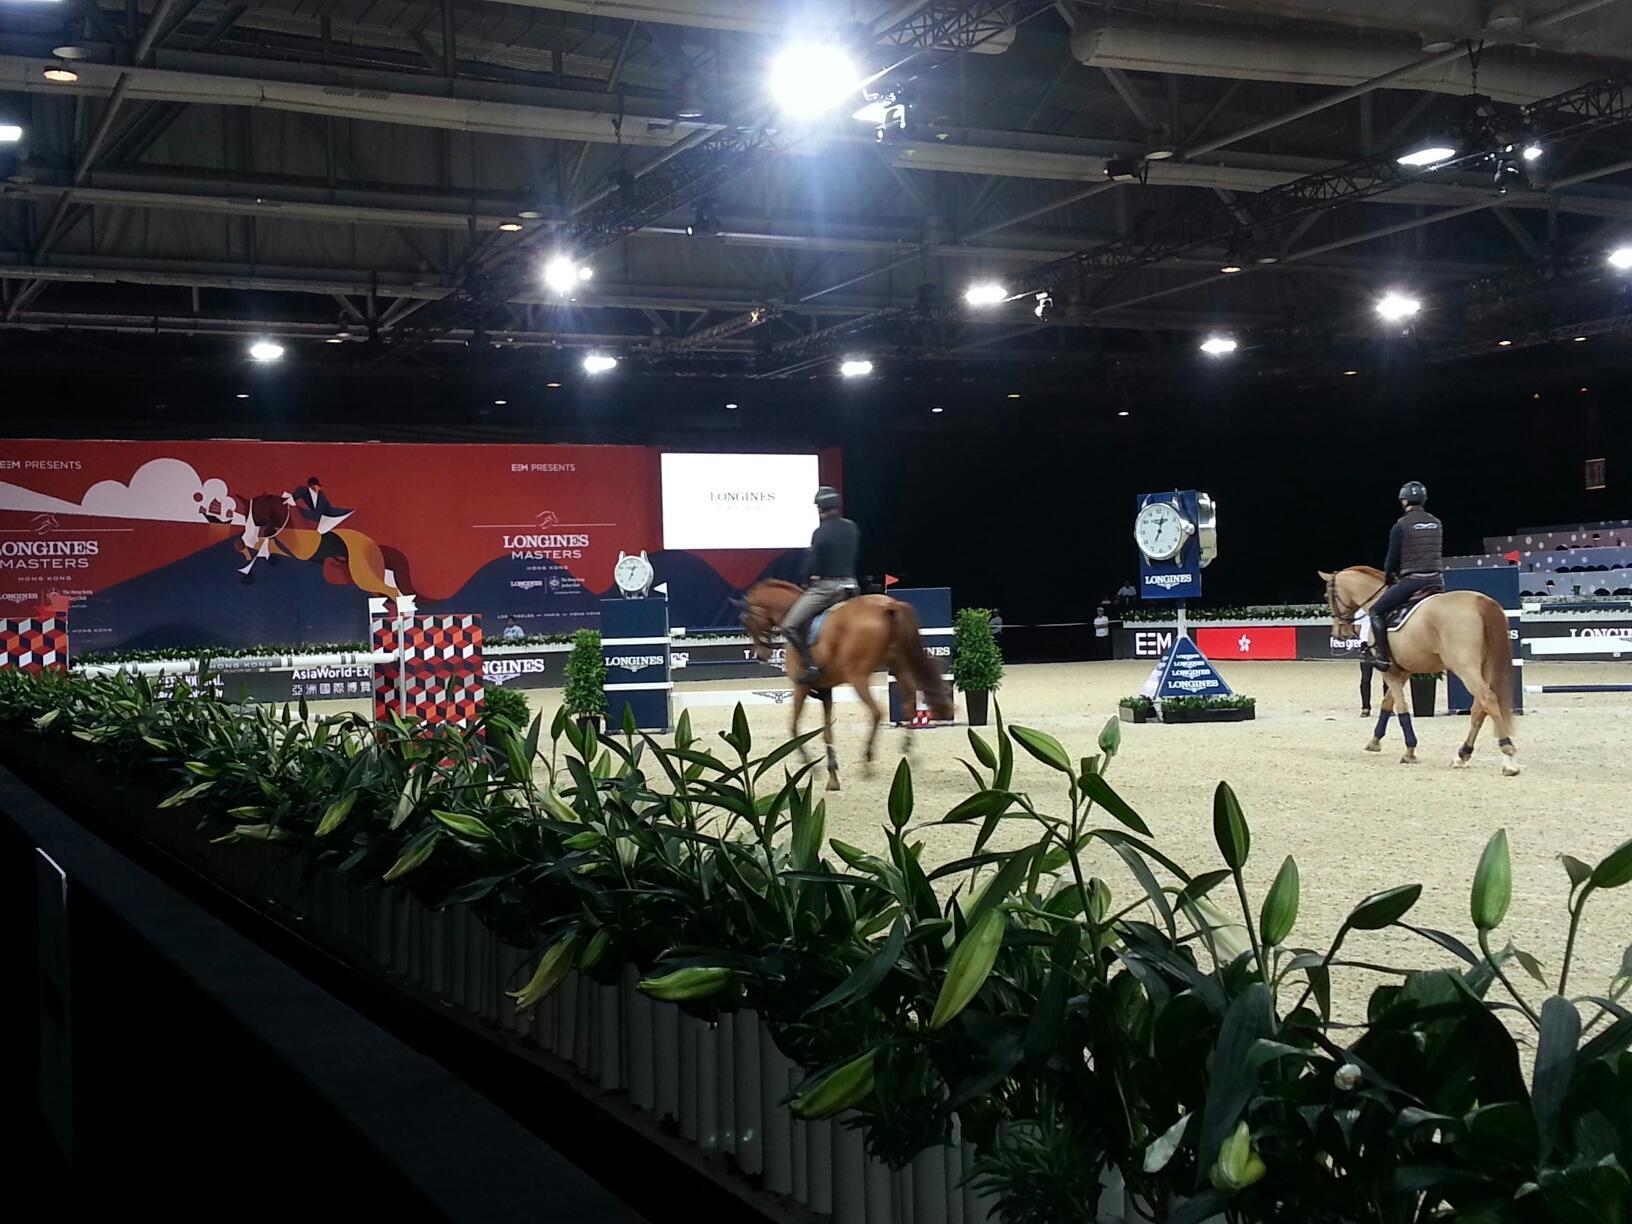 ATA_2017_Longines_horses_in_ring